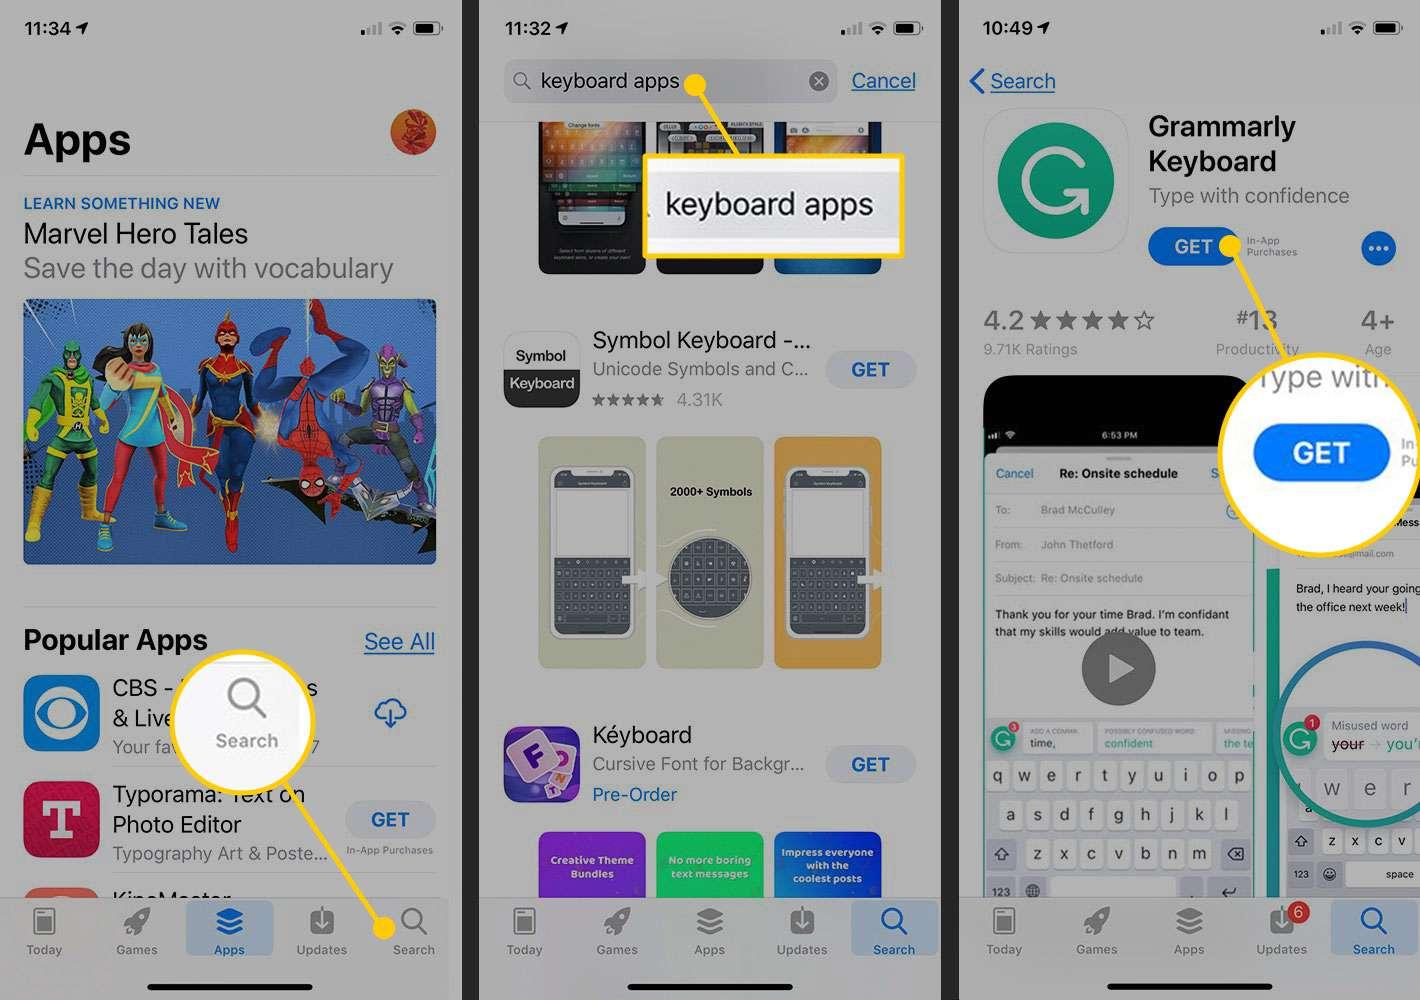 Downloading keyboard app in the iOS App Store